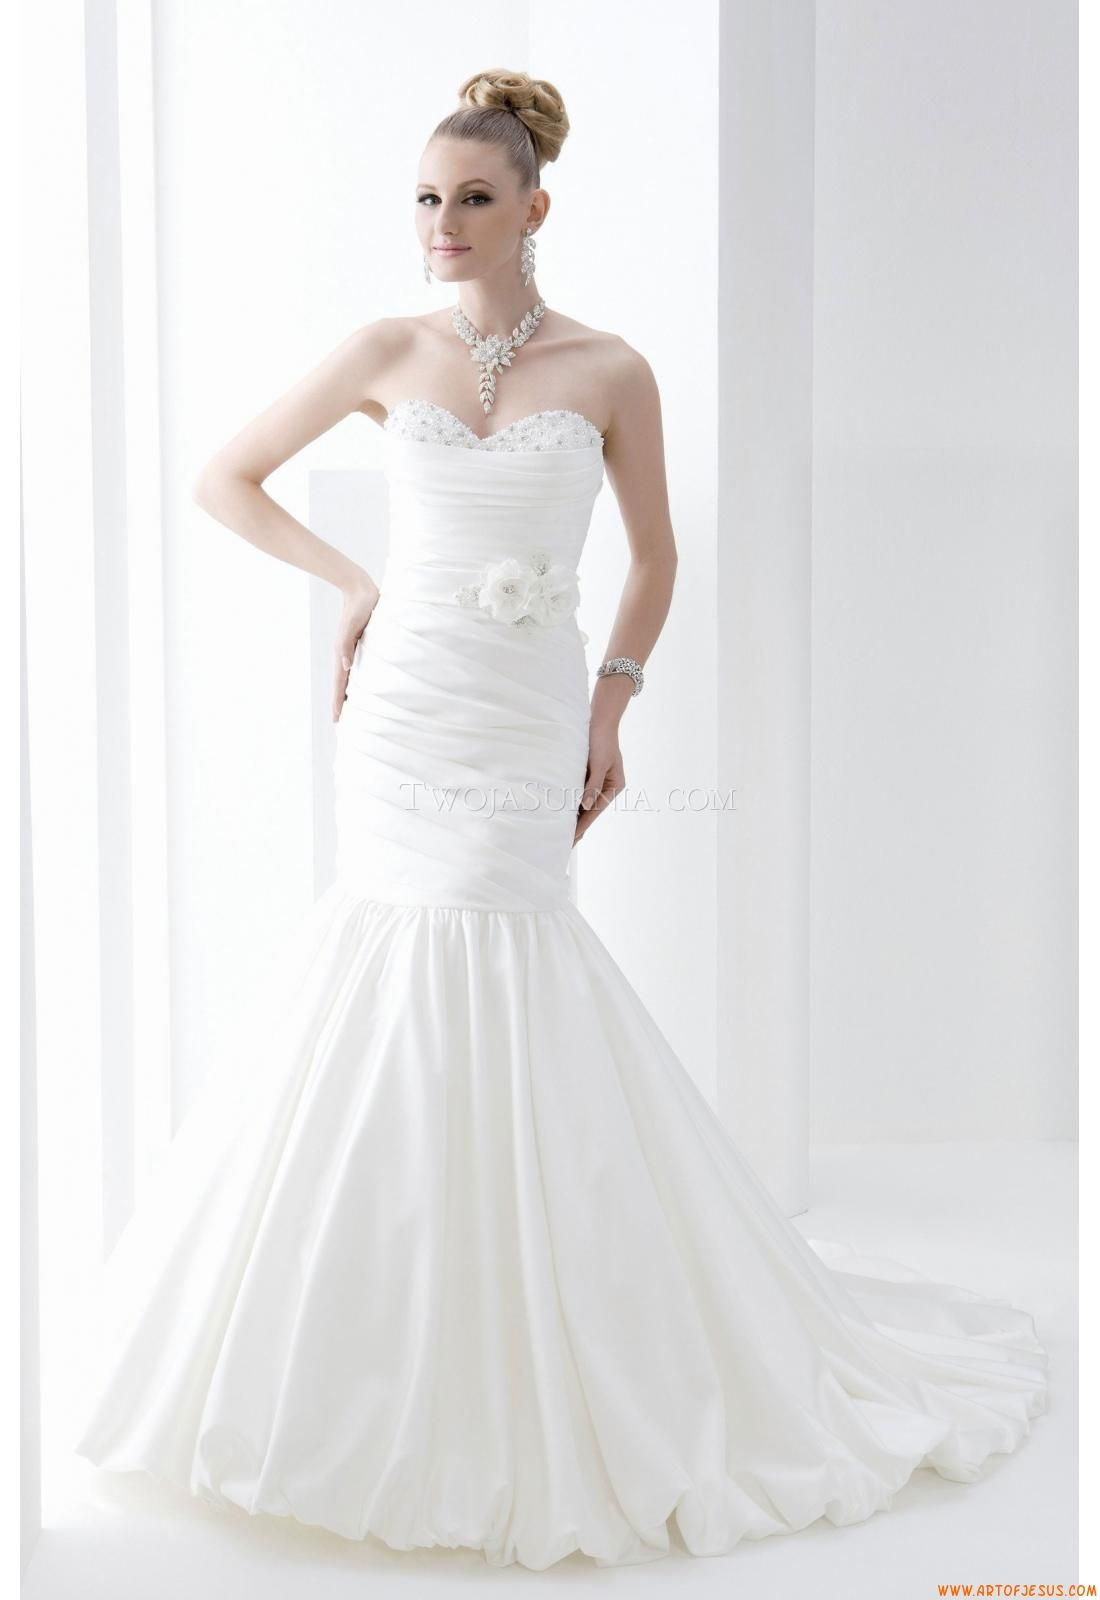 Sweetheart ball gown wedding dress  Elegant Sweetheart Ball Gown Wedding Dress CHina Venus PA Pallas